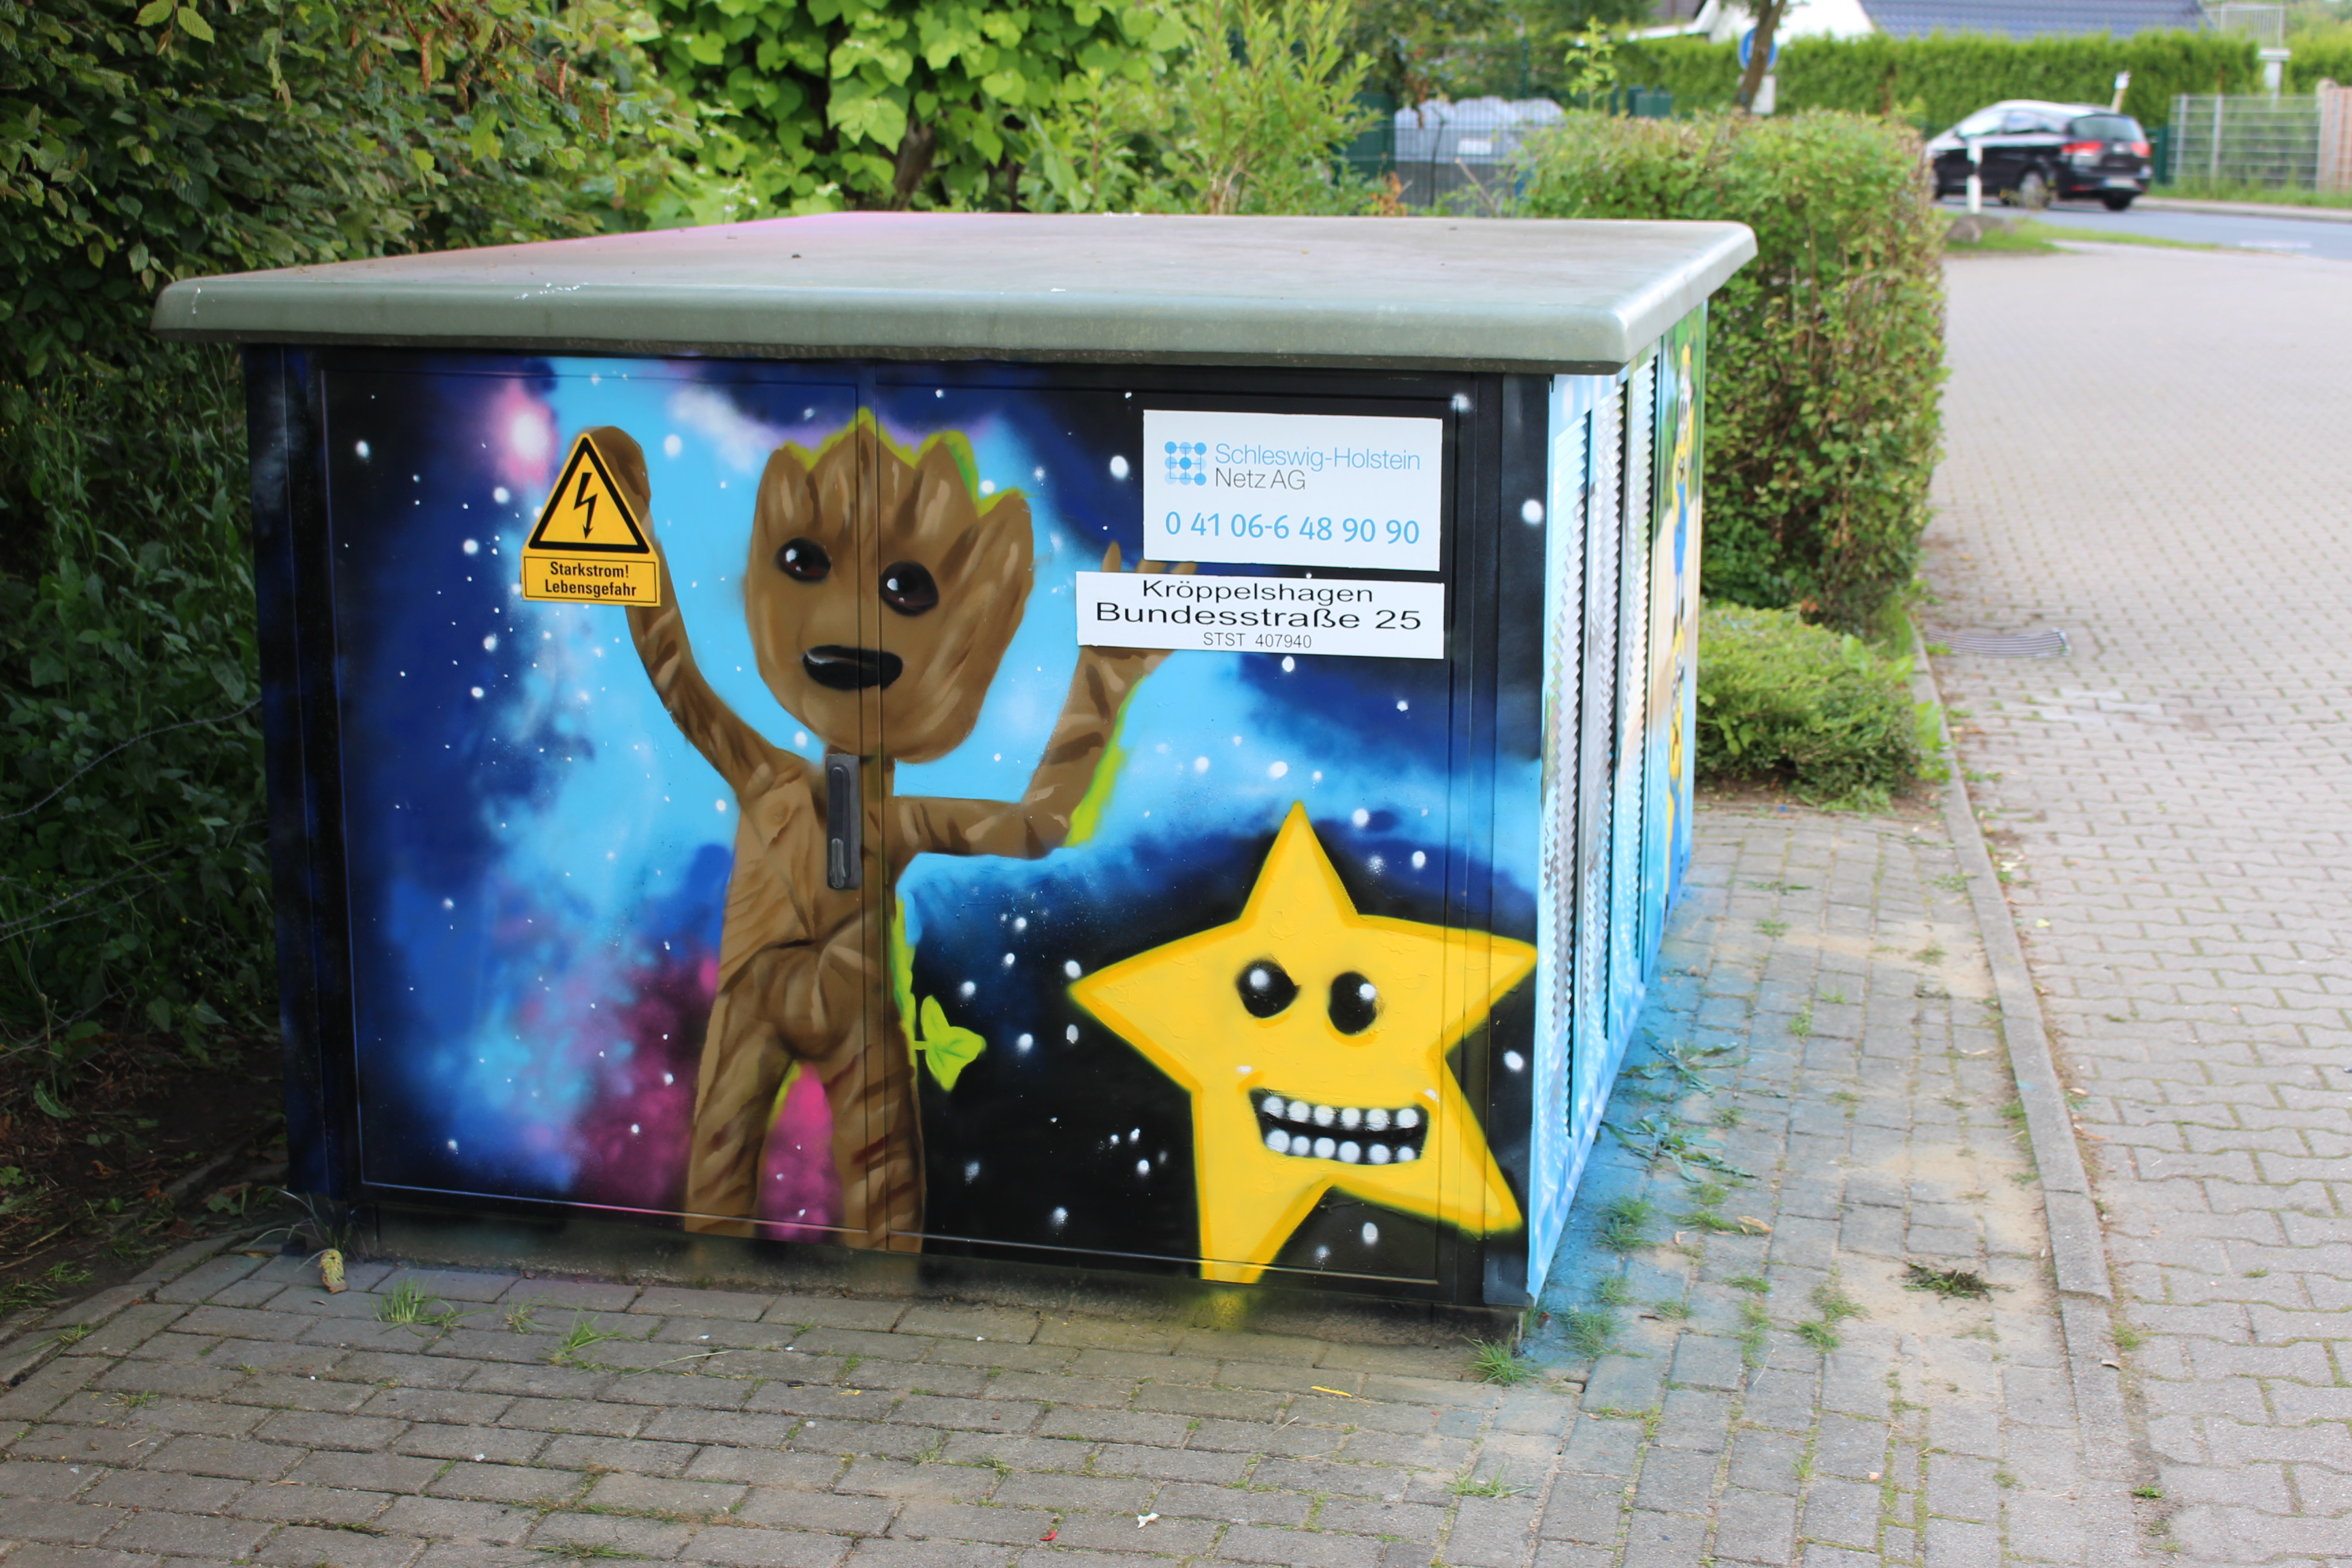 Graffitiprojekt Kröppelshagen Trafostation Seite1 Baby Groot Stern